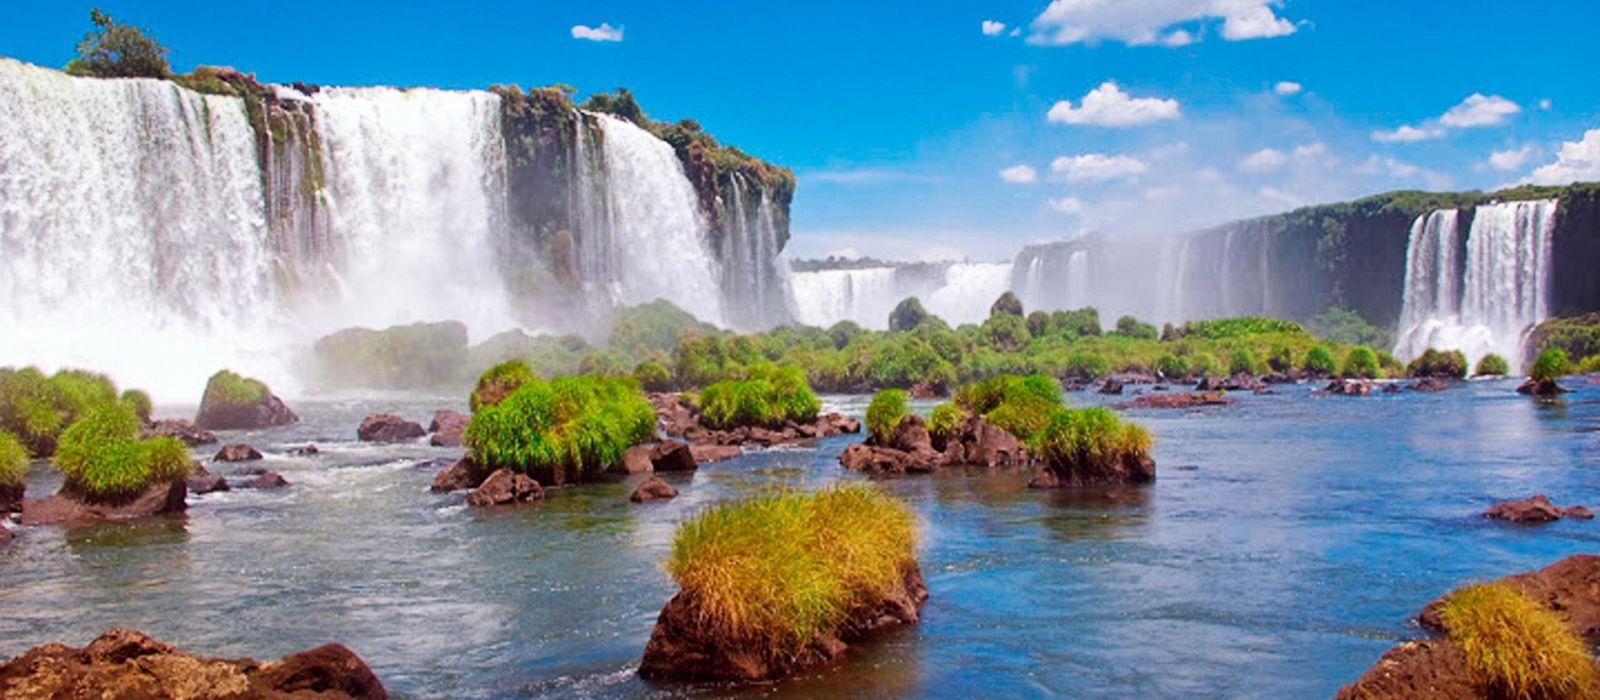 Brazil's Wildlife, Waterfalls and Beach Tour Trip 3